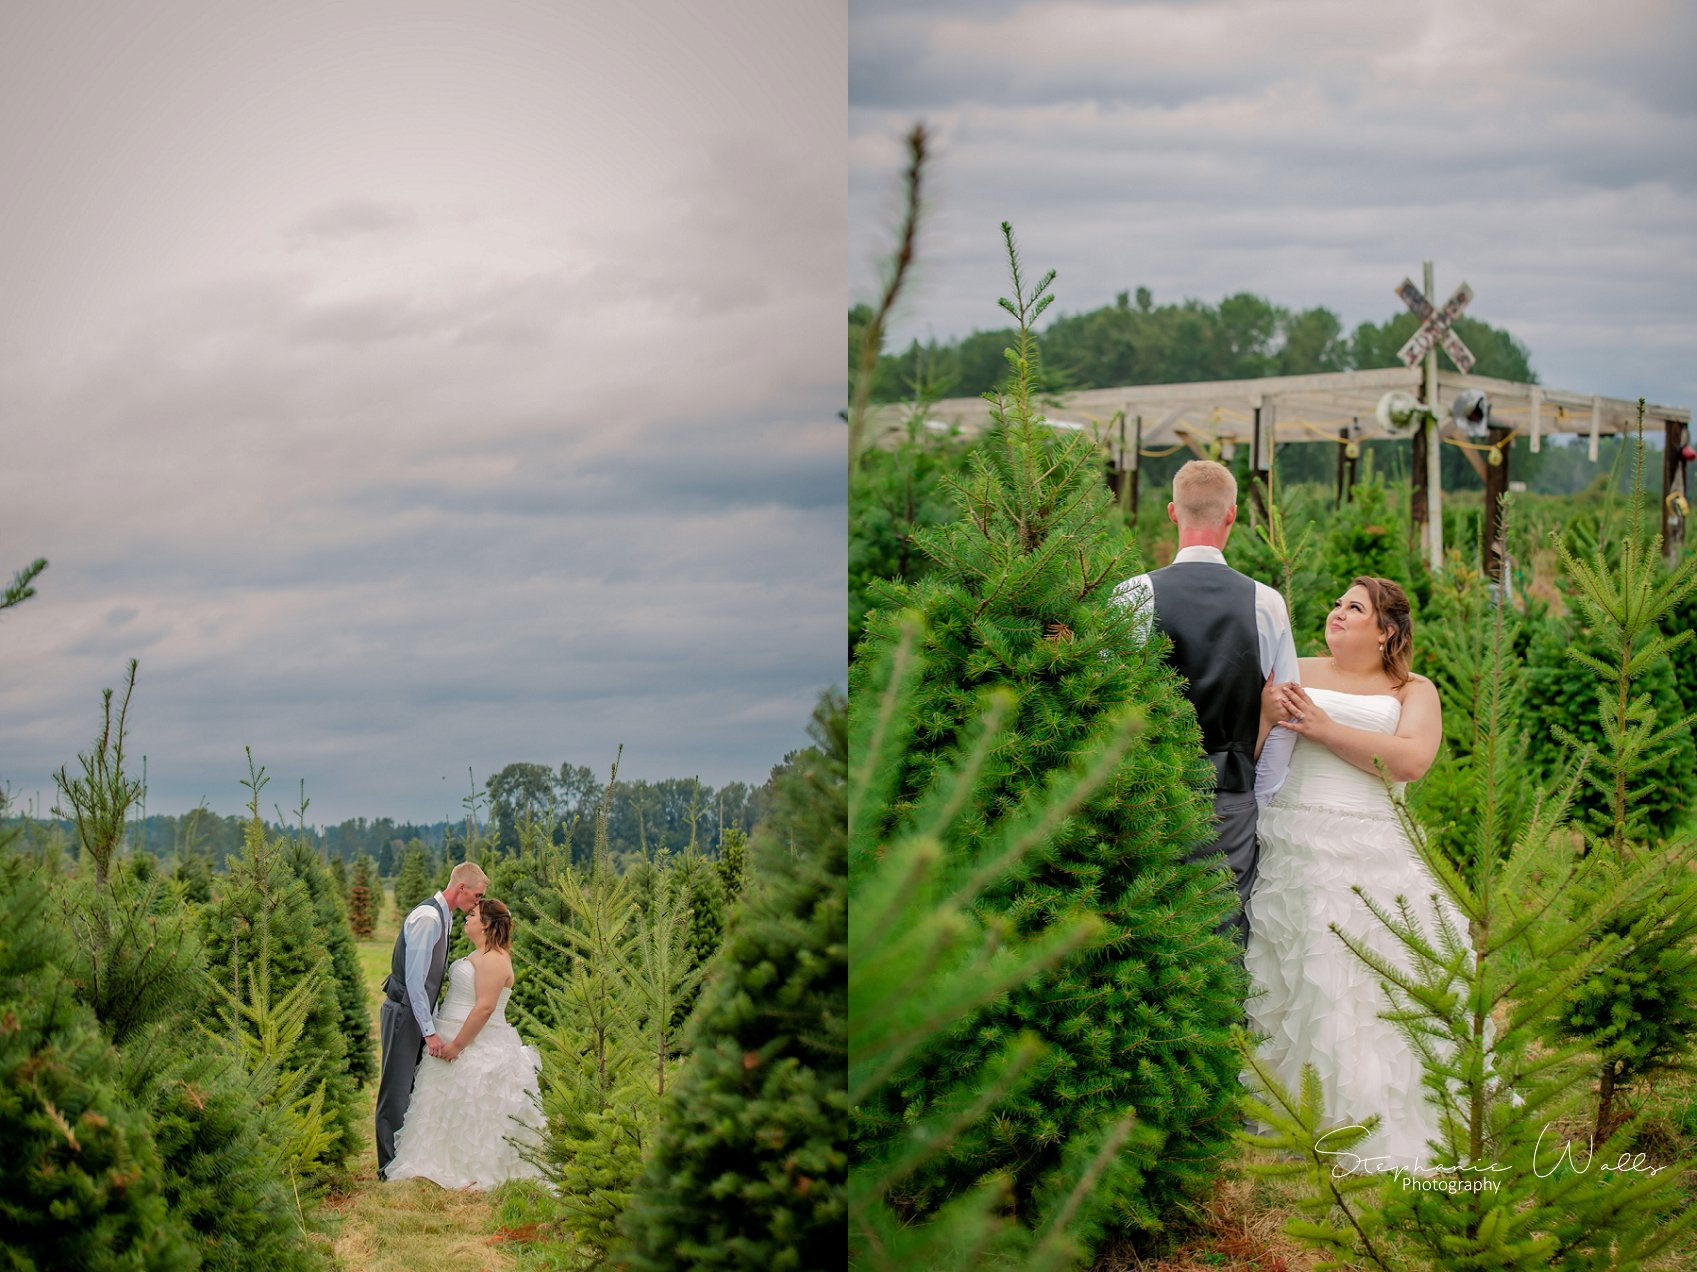 Kimble Wedding 092 Marlena & Allans | Snohomish Red Barn Events (Stocker Farms) | Snohomish, Wa Wedding Photographer